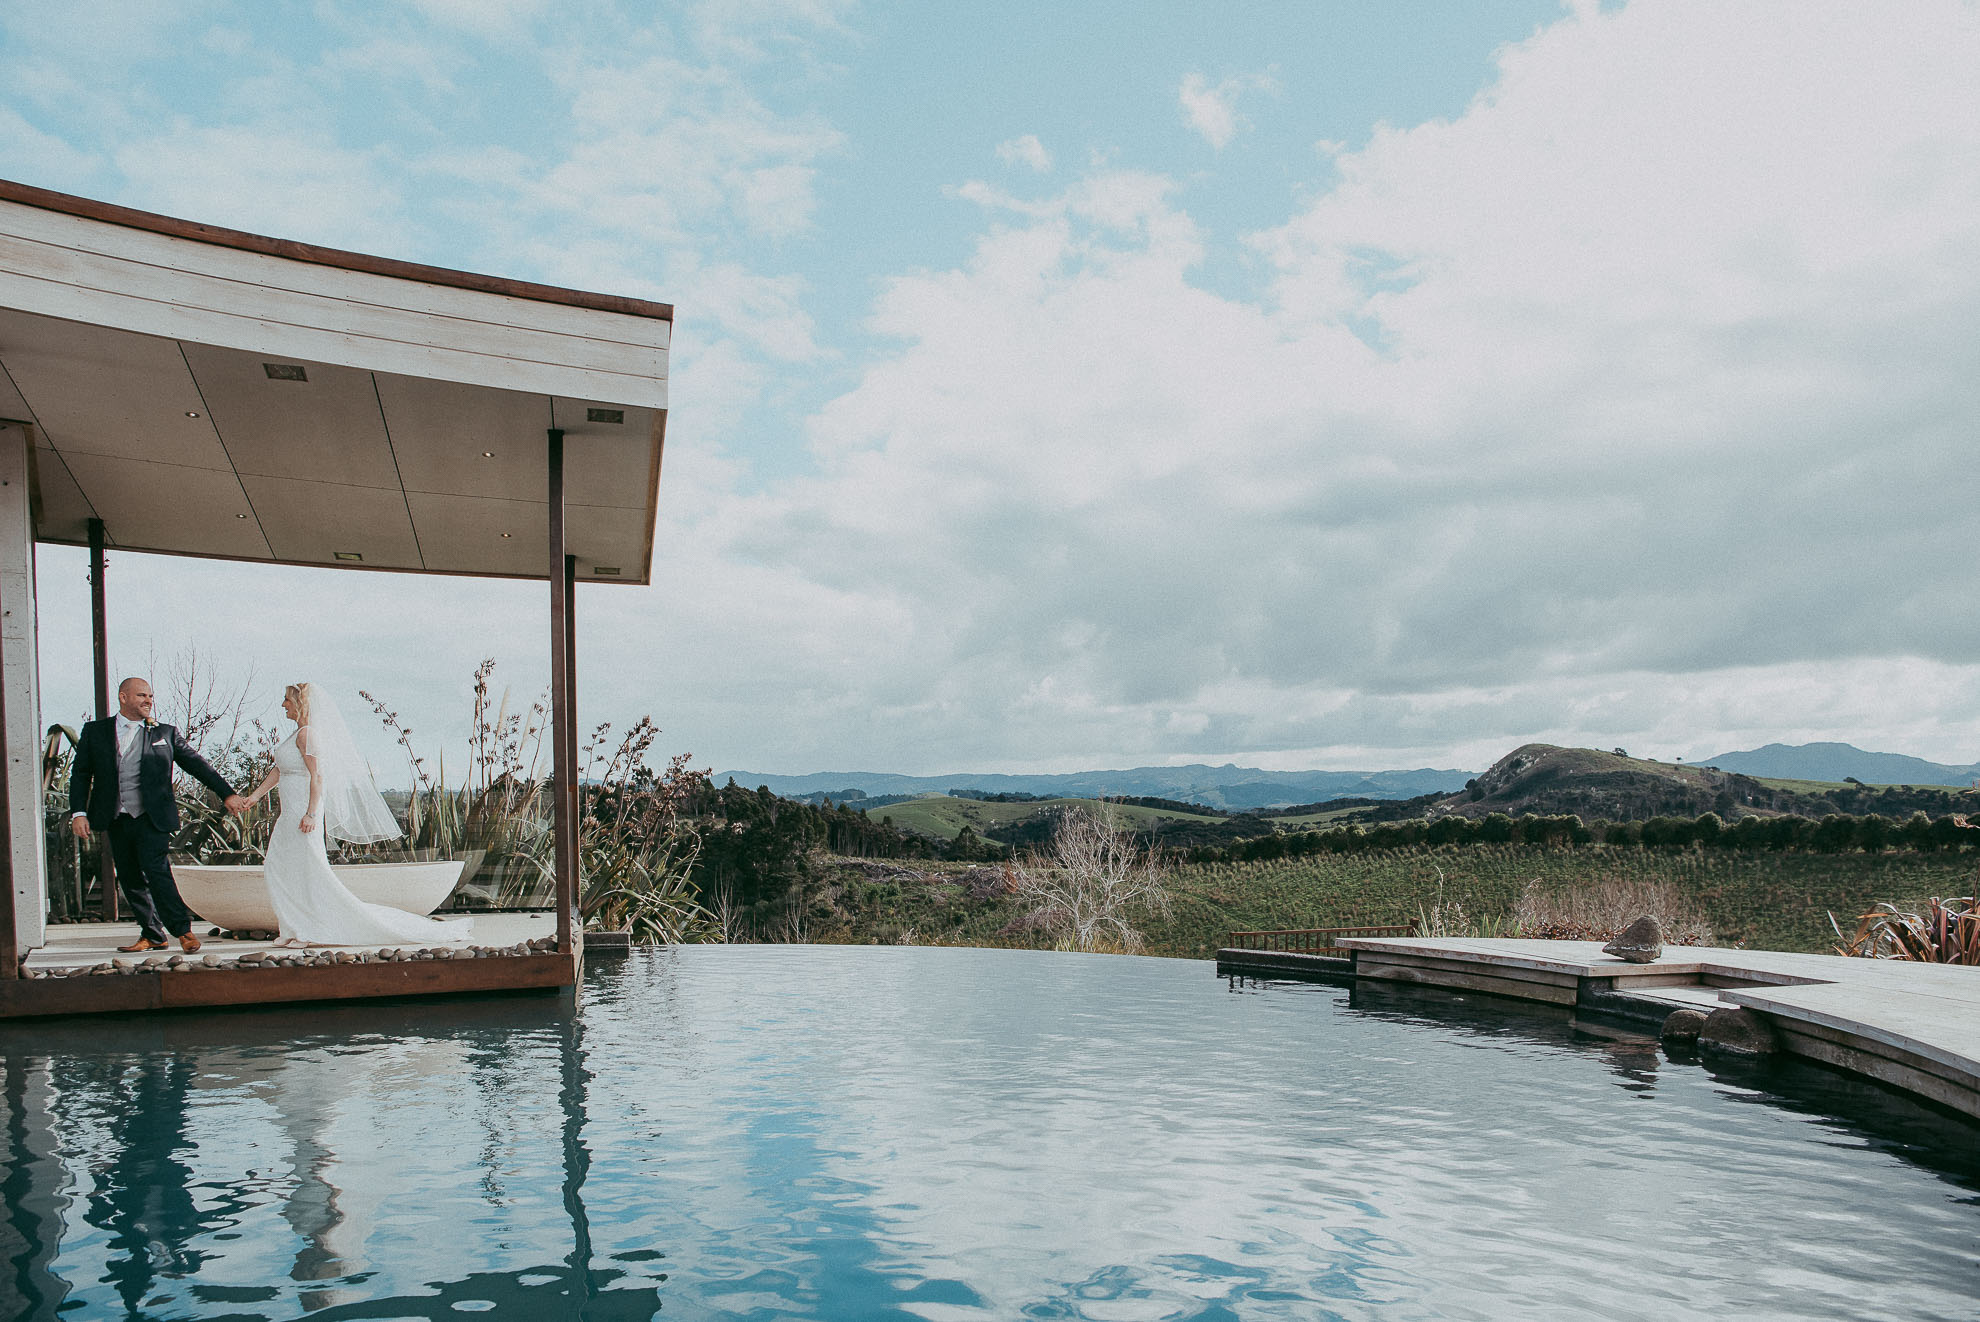 Tawharanui Winter Wedding - Koru House {New Zealand elopement-engagement photographer}